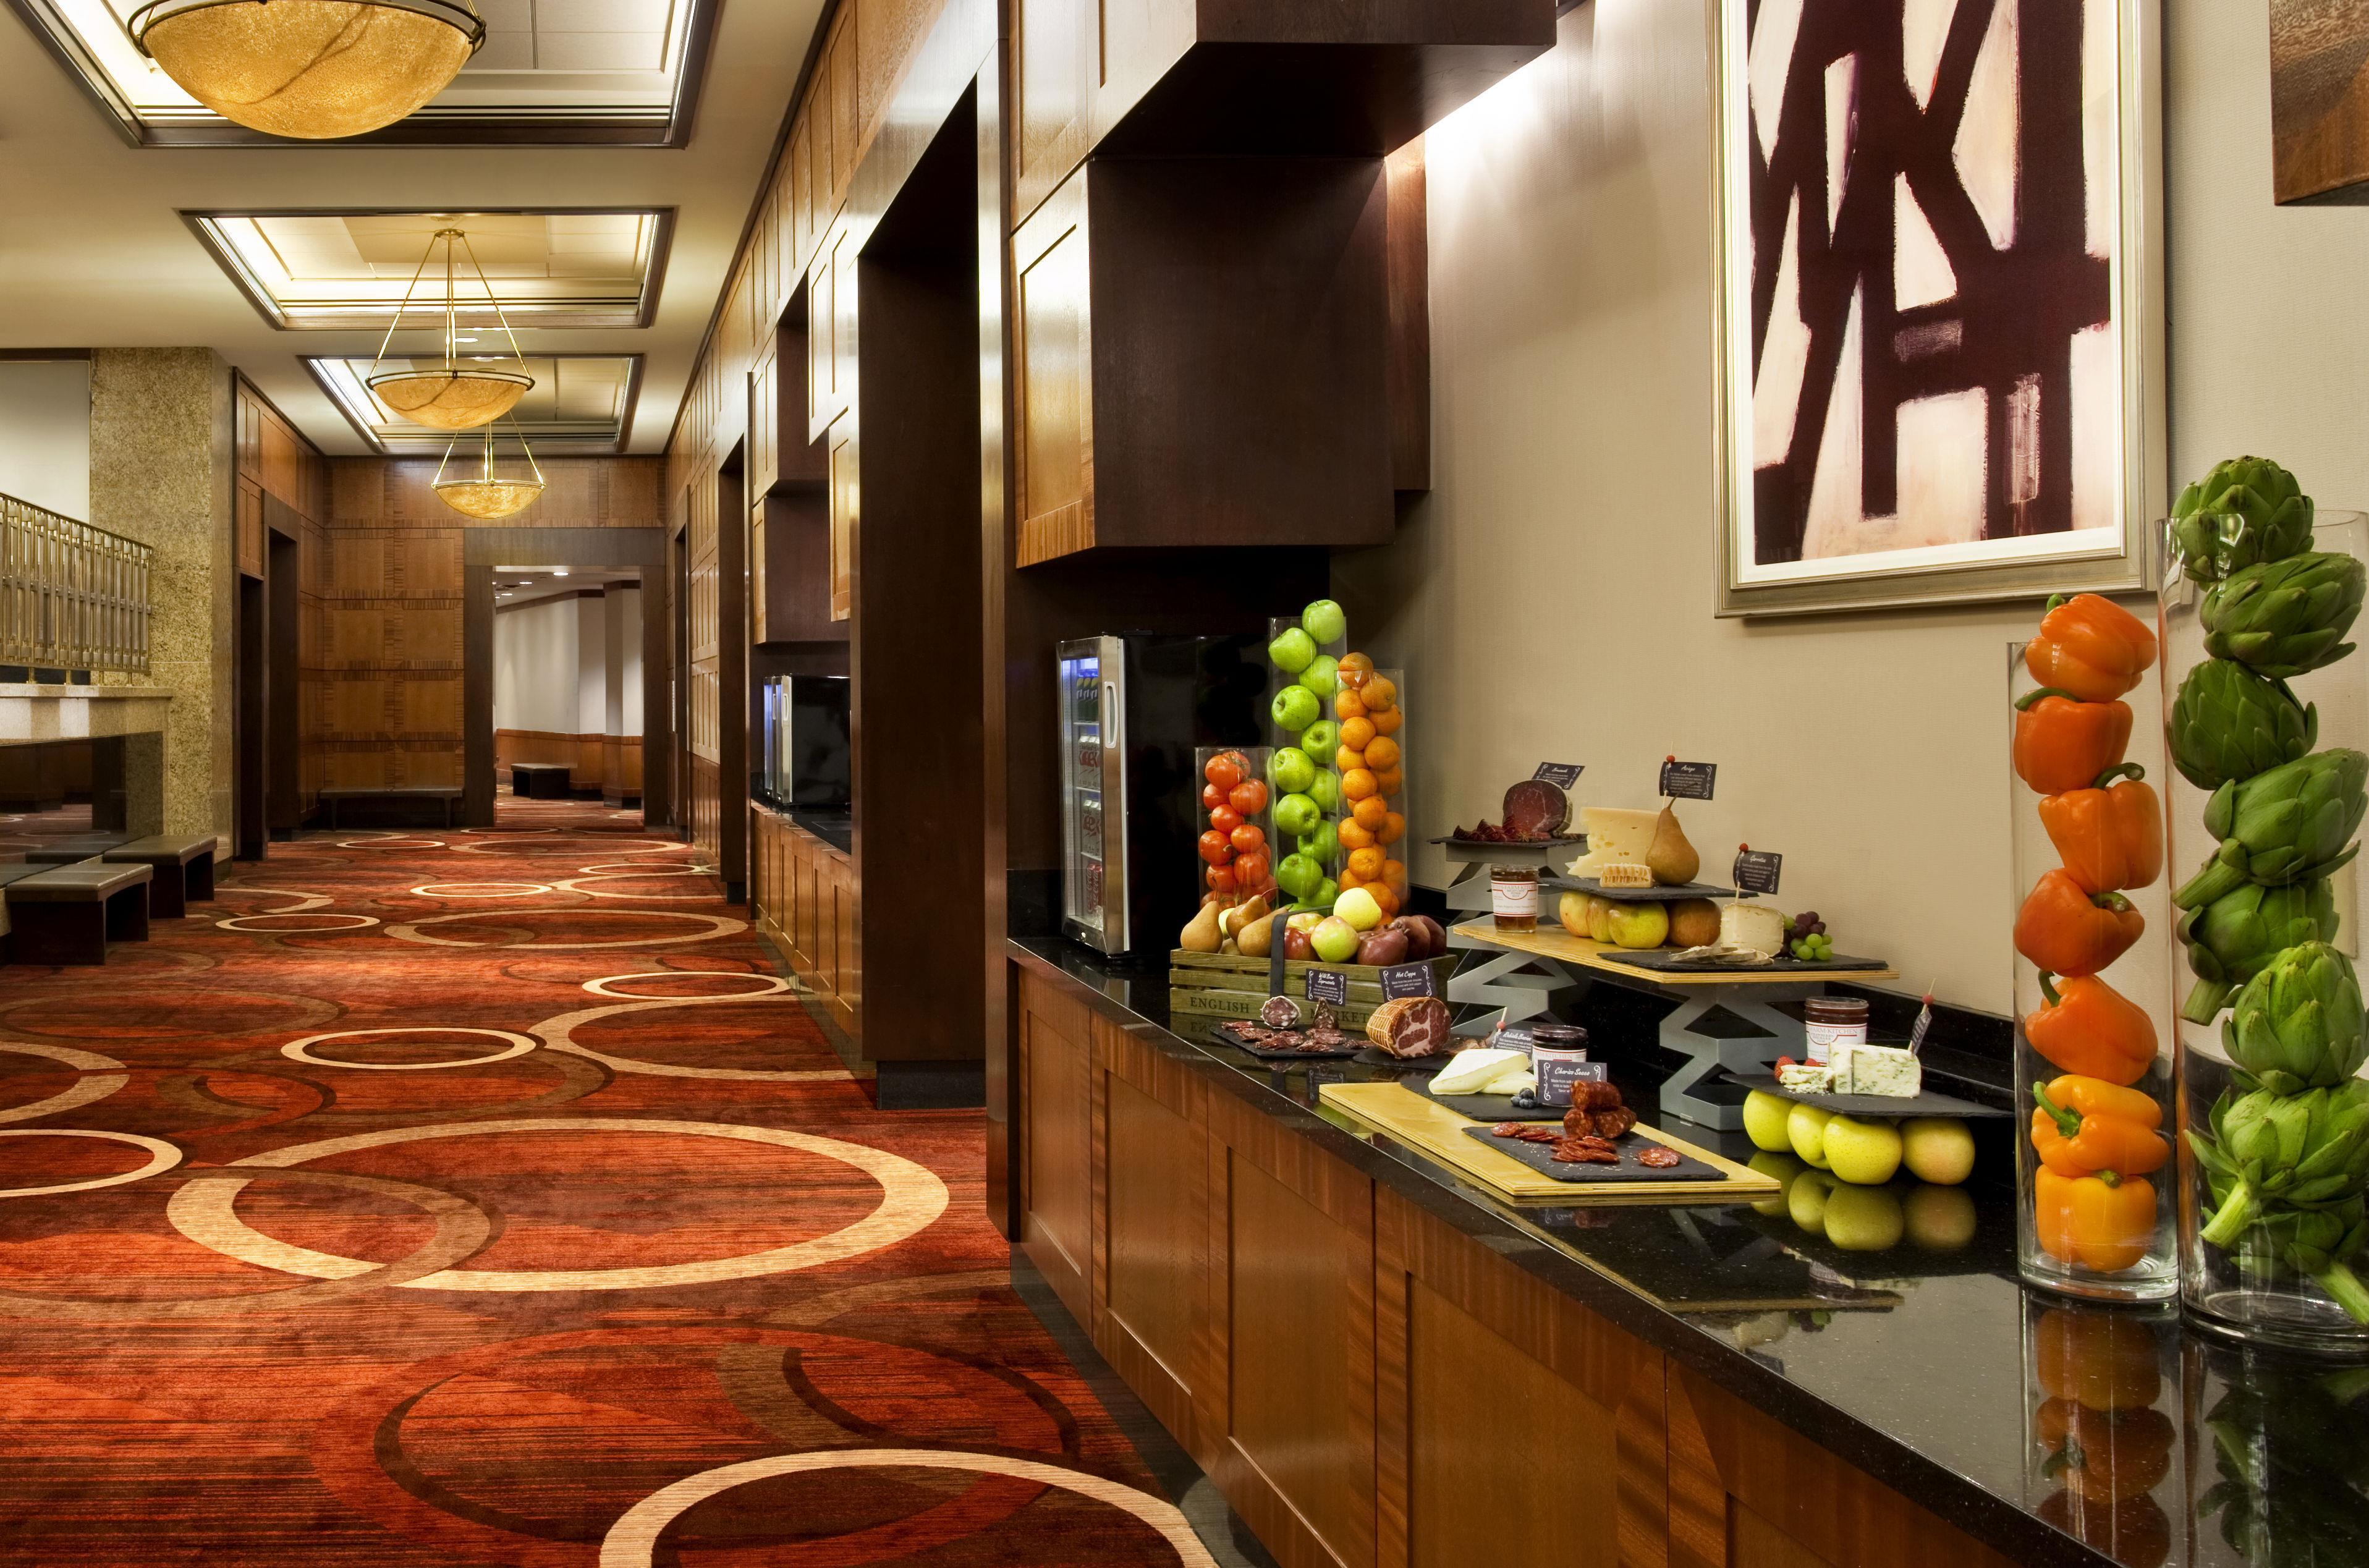 Sheraton New York Times Square Hotel image 35